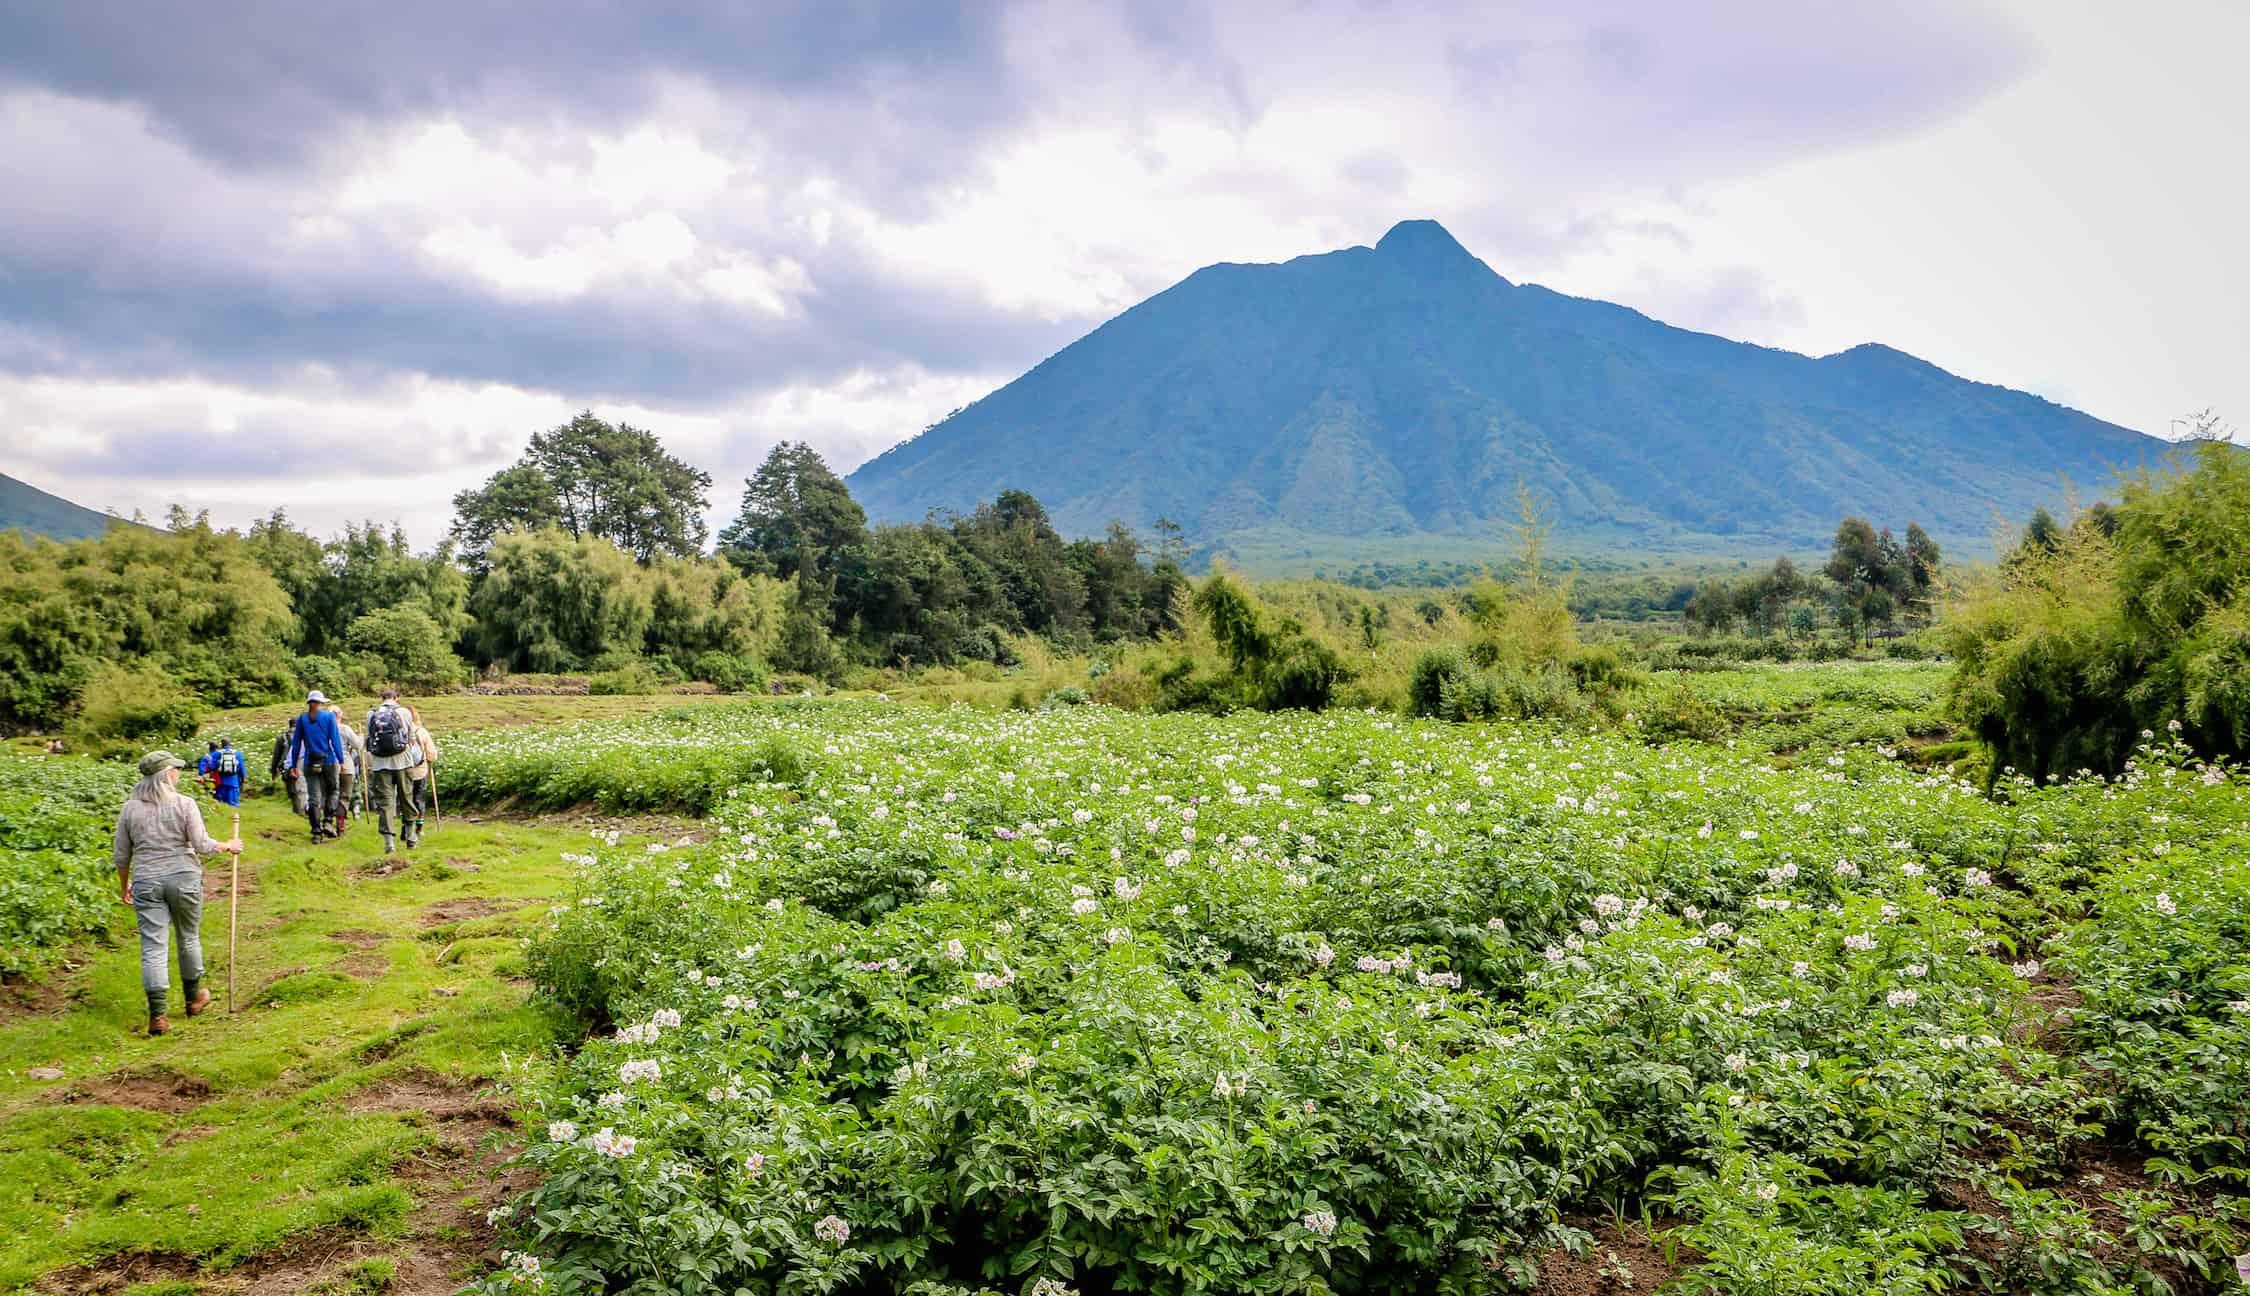 Trekking in Rwanda's Parc National des Volcans